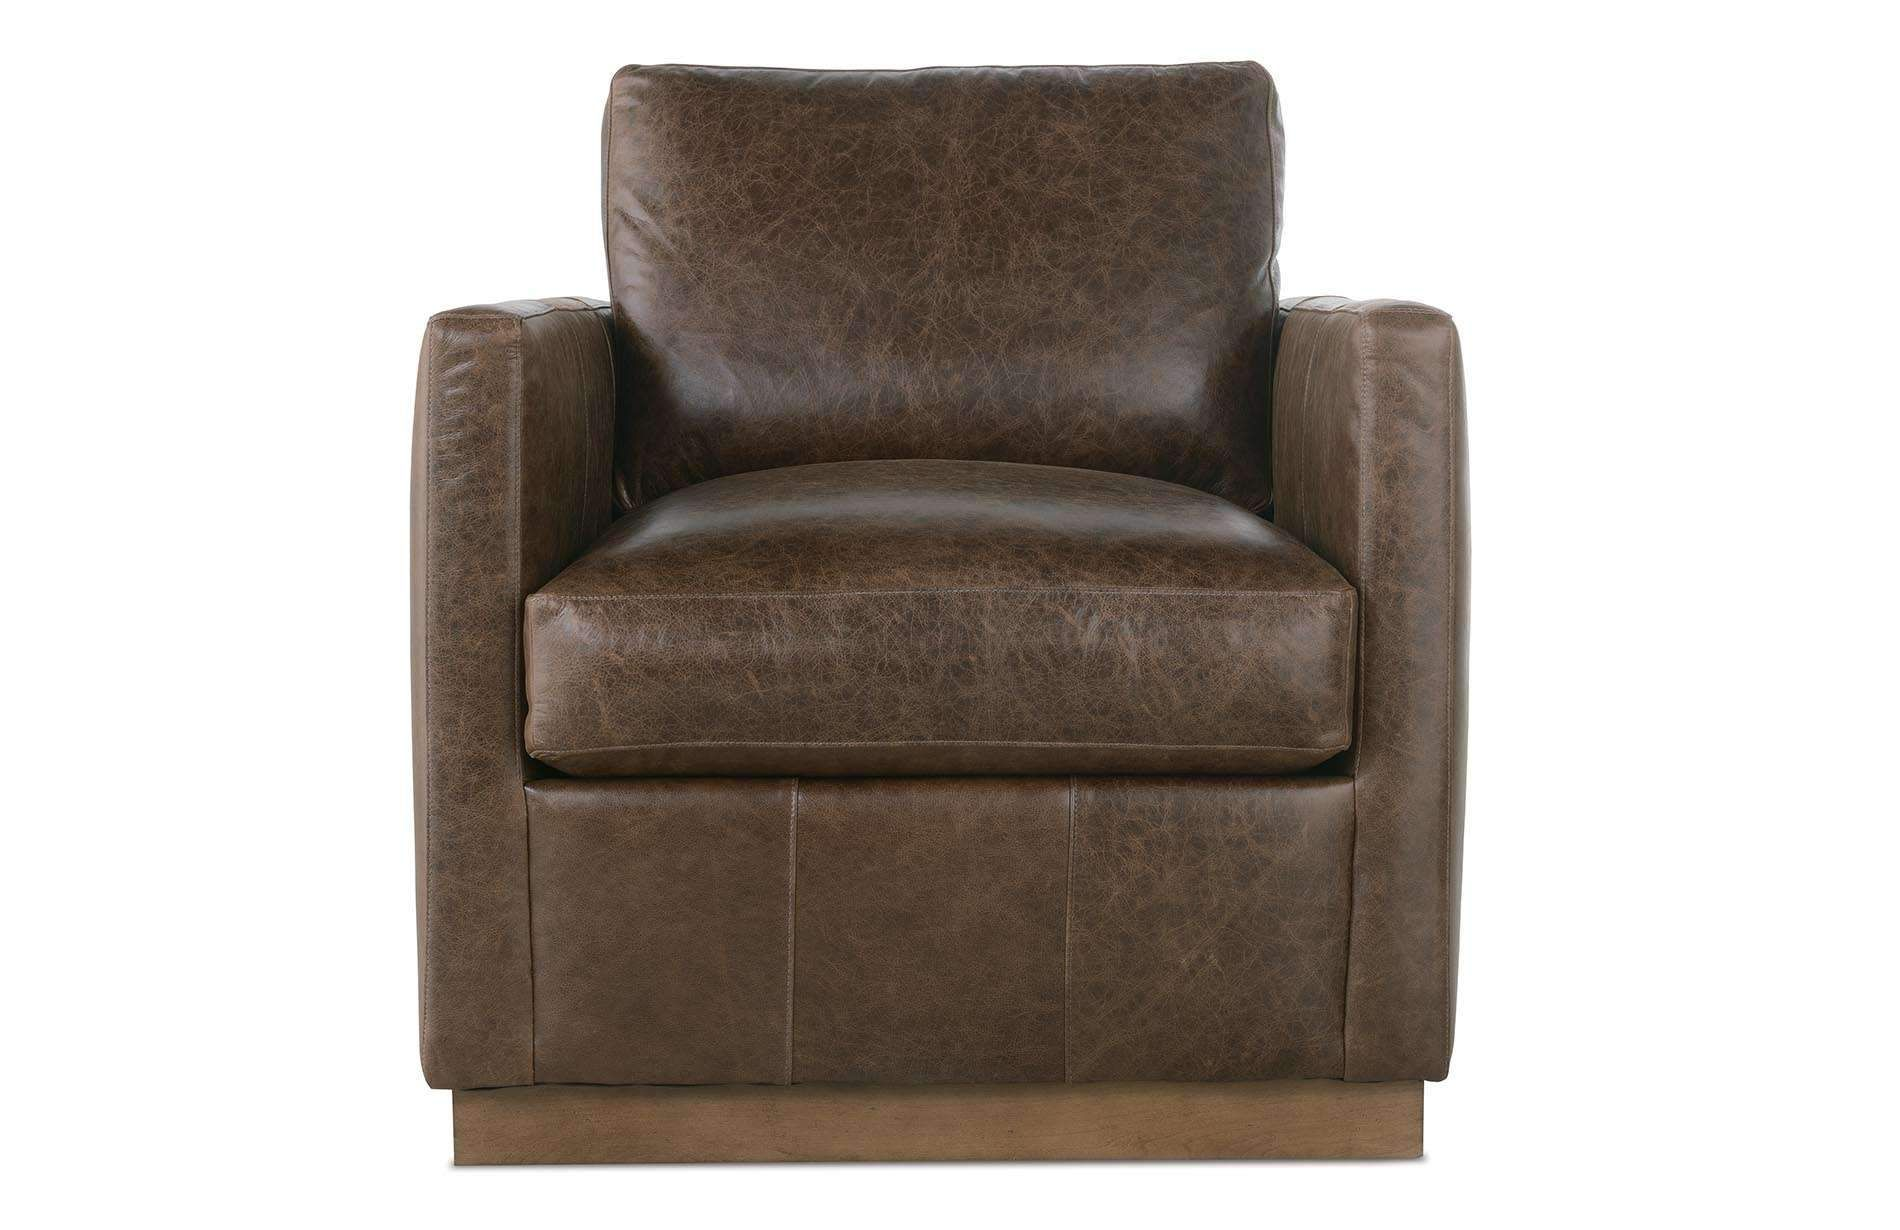 ashton swivel chair  leather swivel chair swivel chair